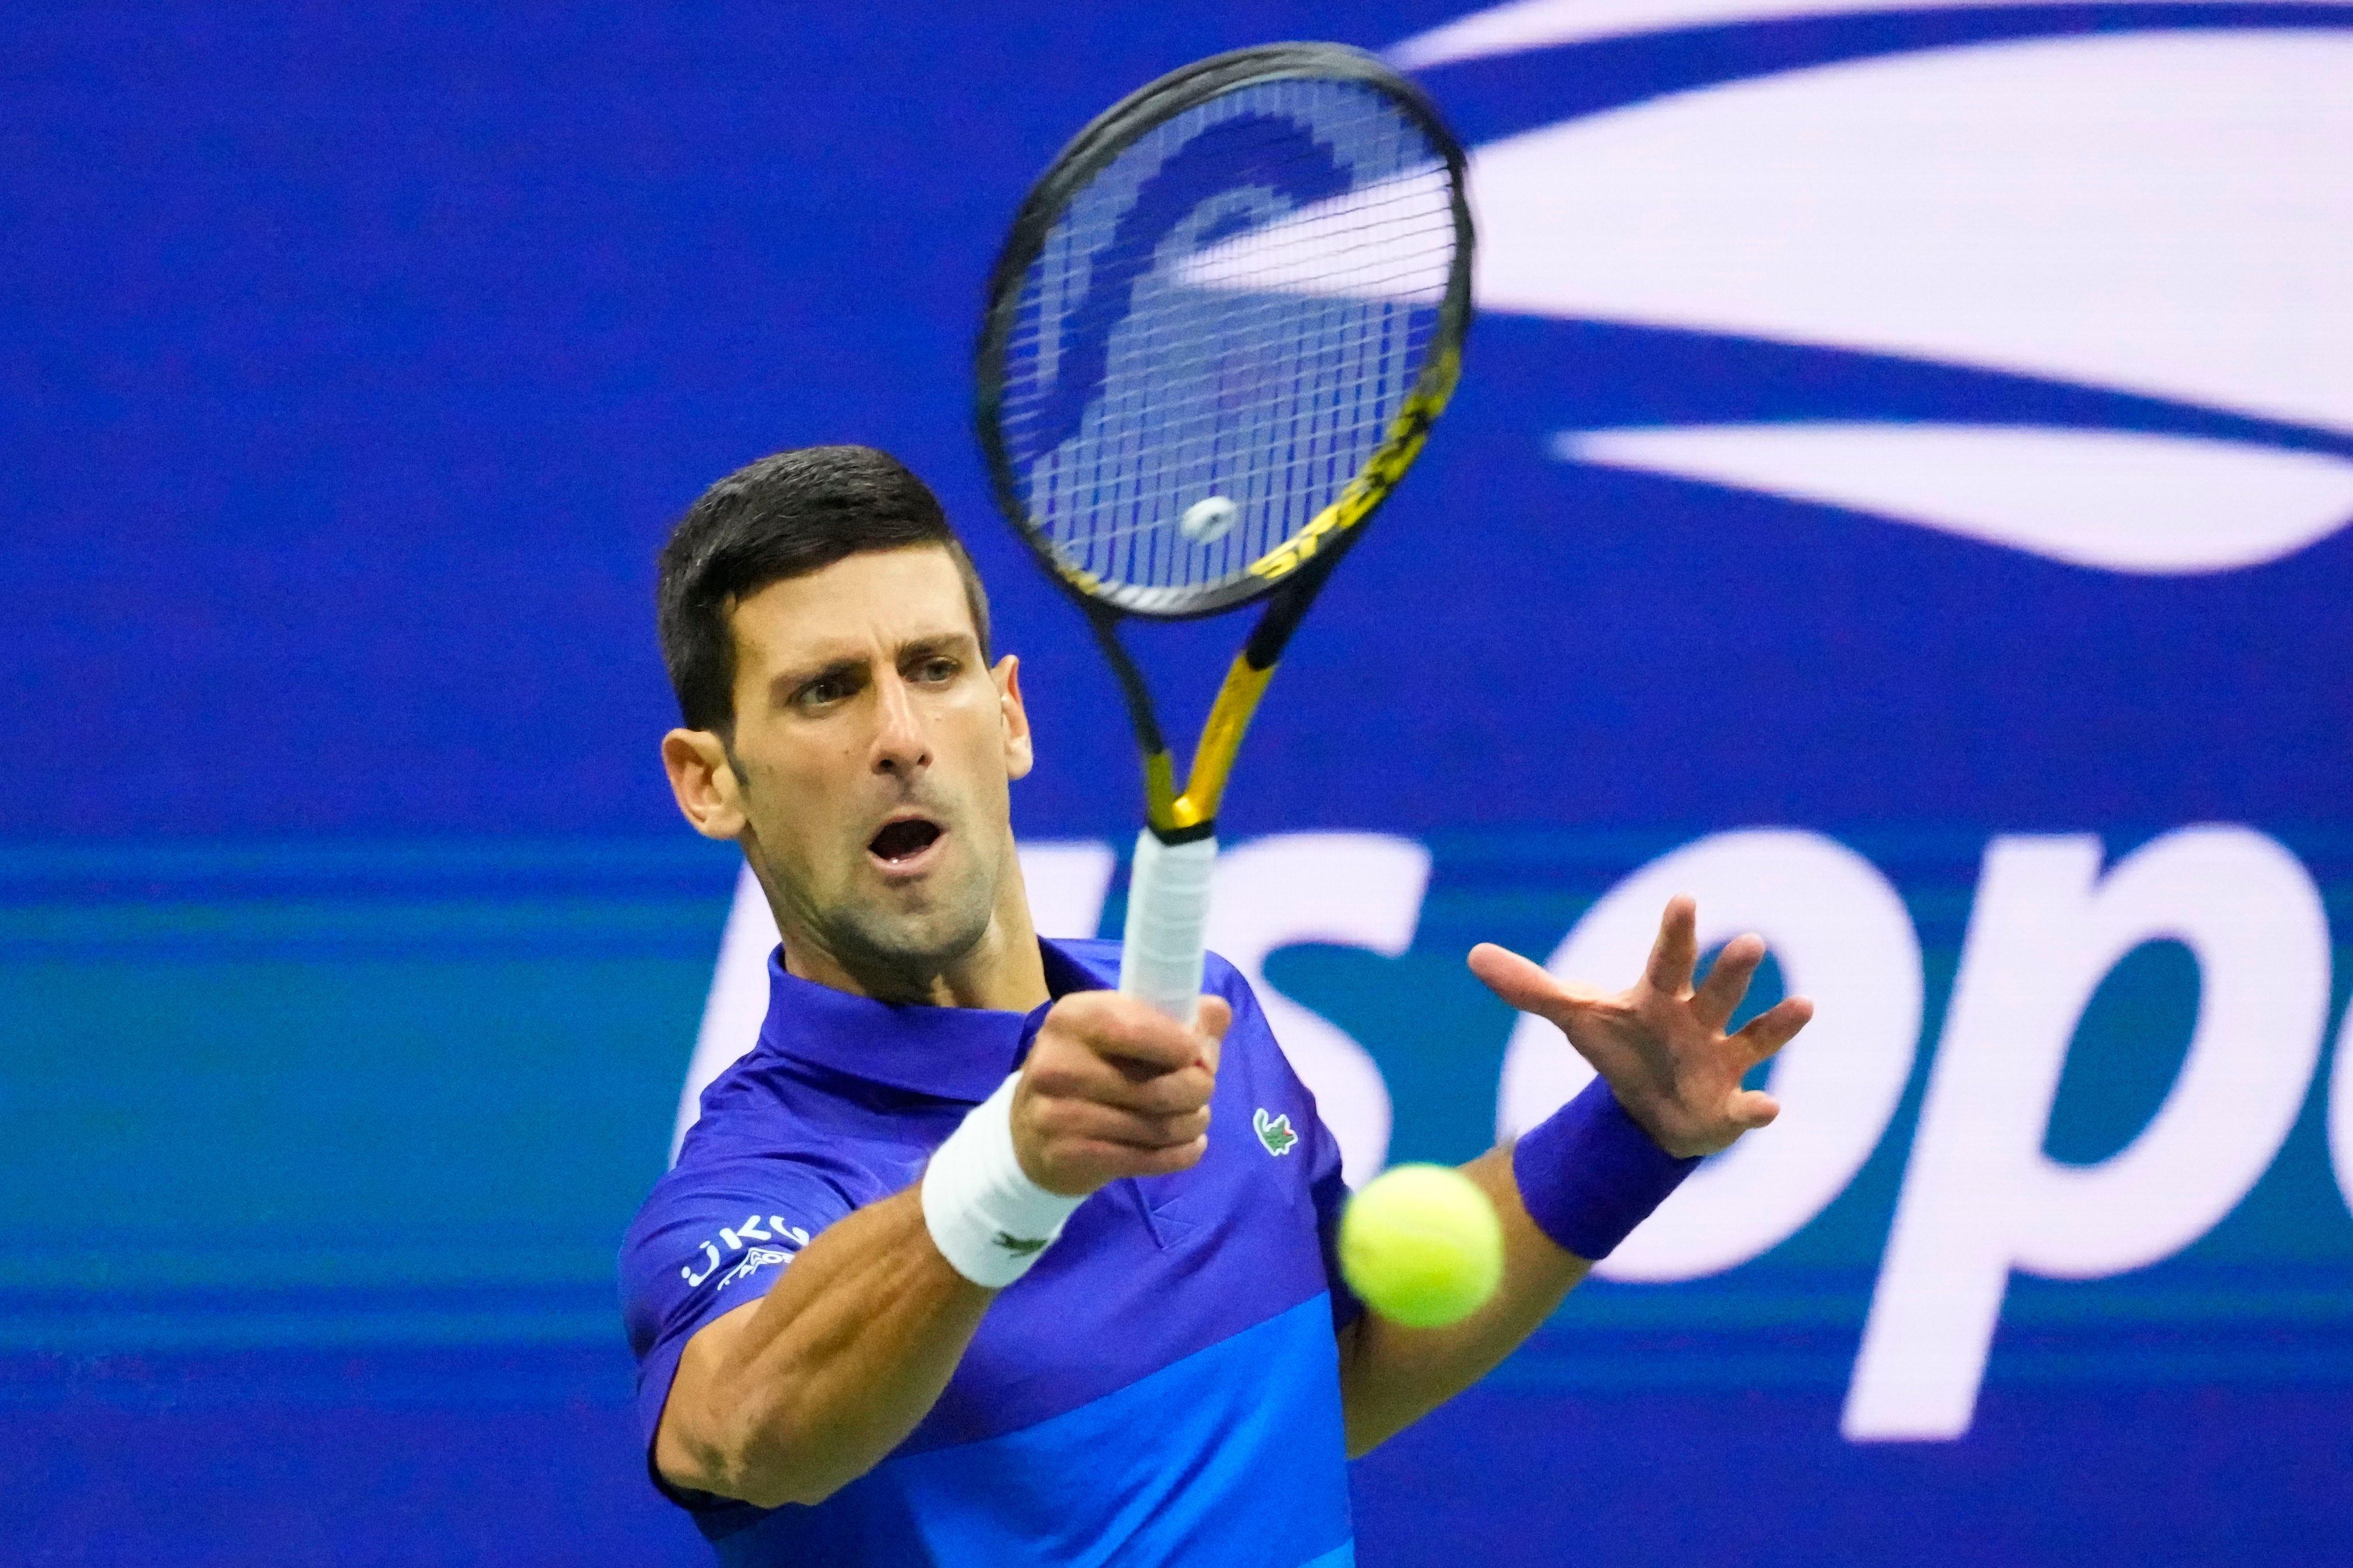 Novak Djokovic tops Alexander Zverev to reach US Open men s final, one win from calendar Grand Slam